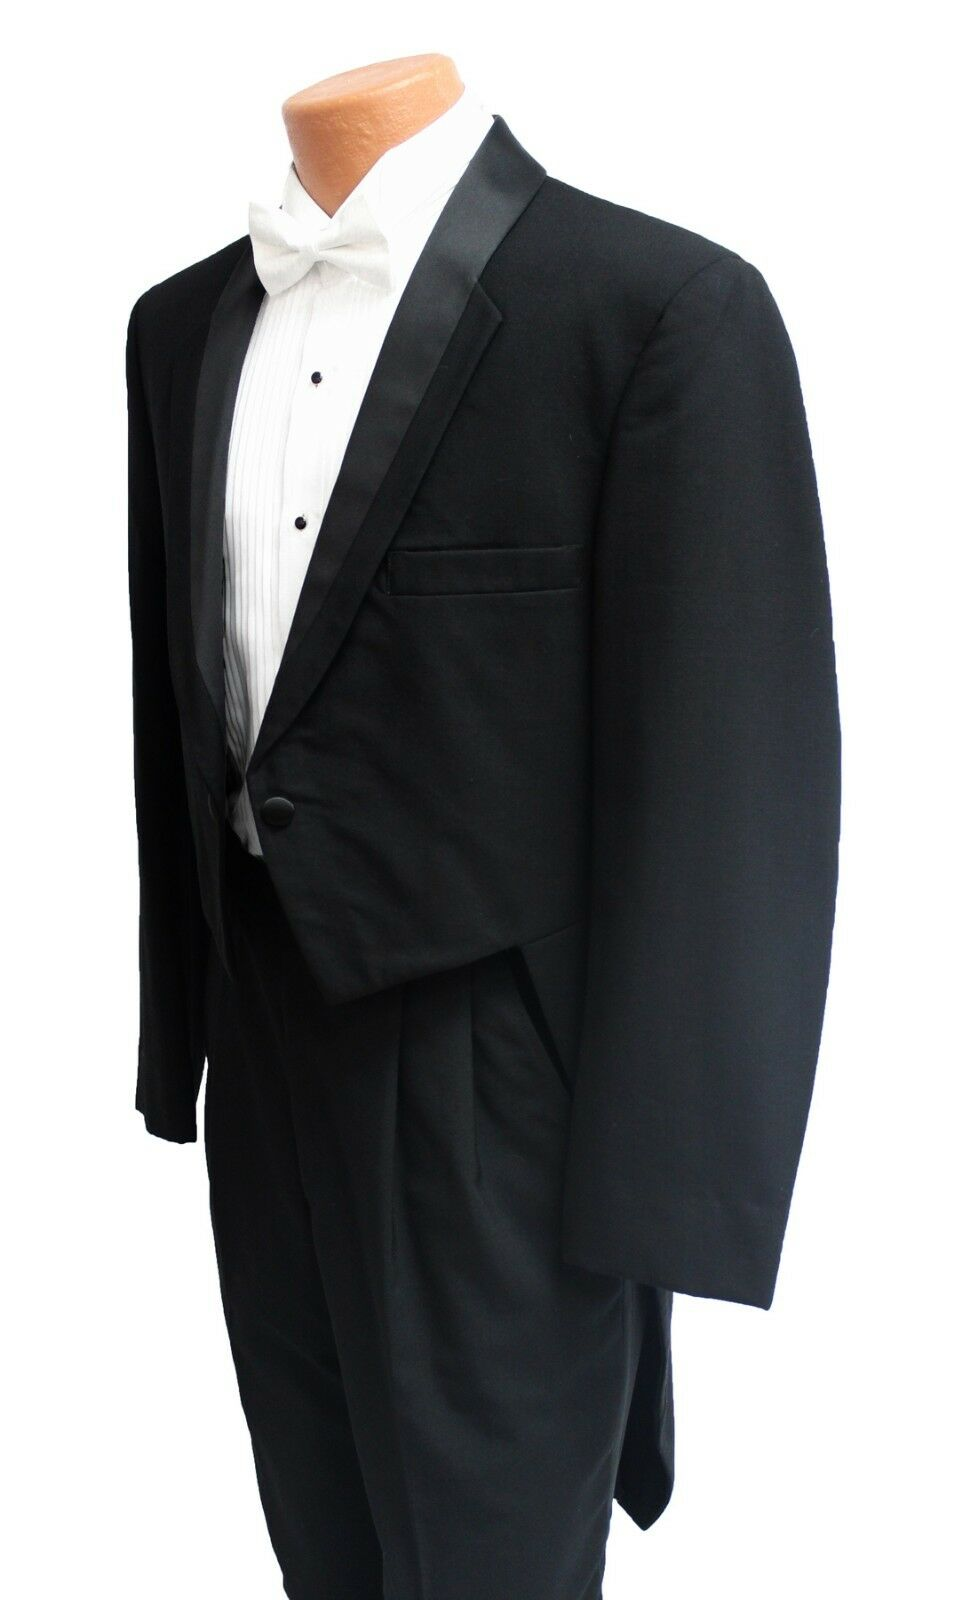 39L Christian Dior Black Toulon Tuxedo Tailcoat 39 Long Mardi Gras Long Tails